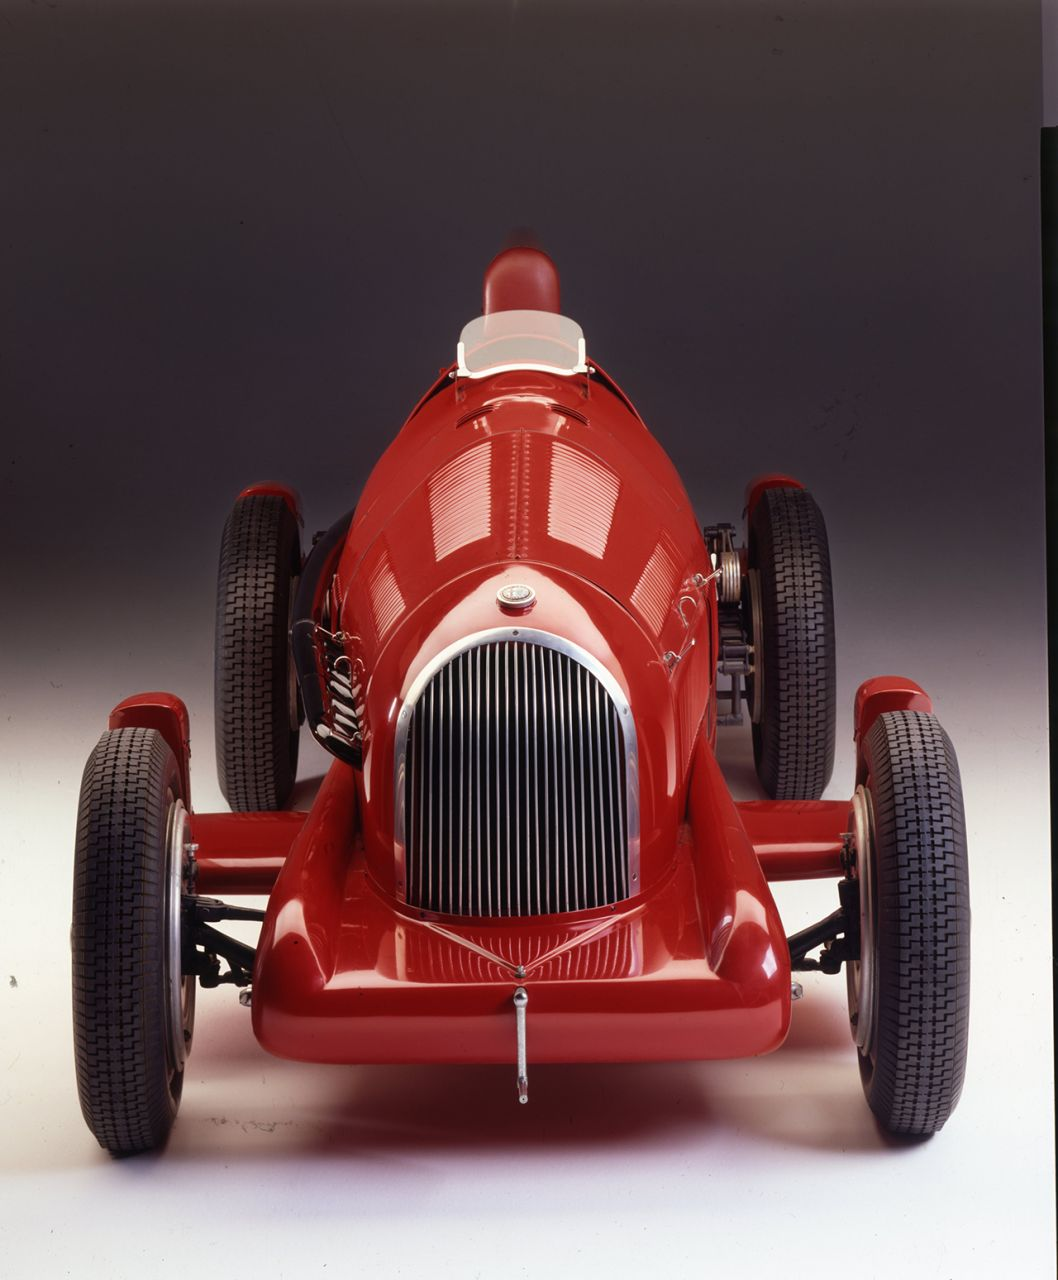 161129_ar_gran_premio_tipo_b_p3_aerodinamica_03